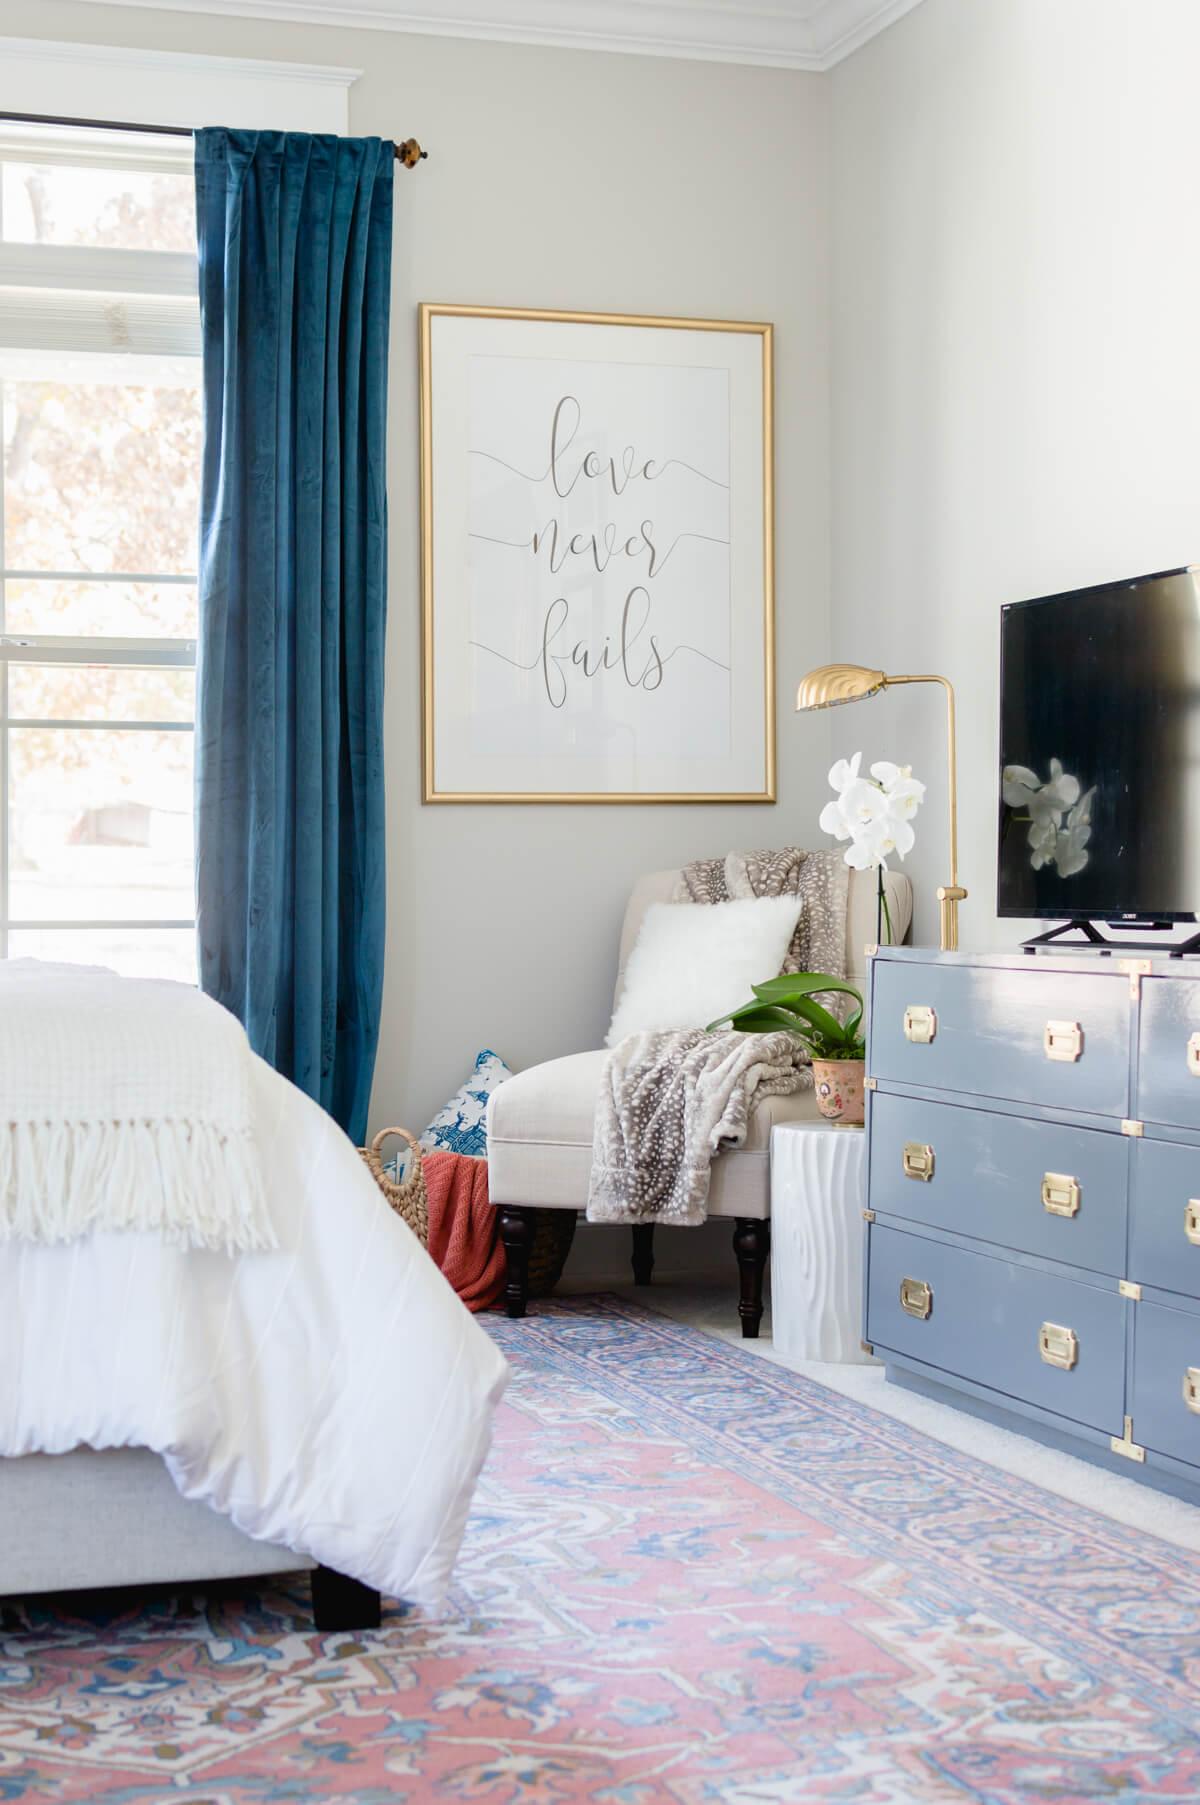 Easy DIY Thrift Store Frame Makeover - The Home I Create